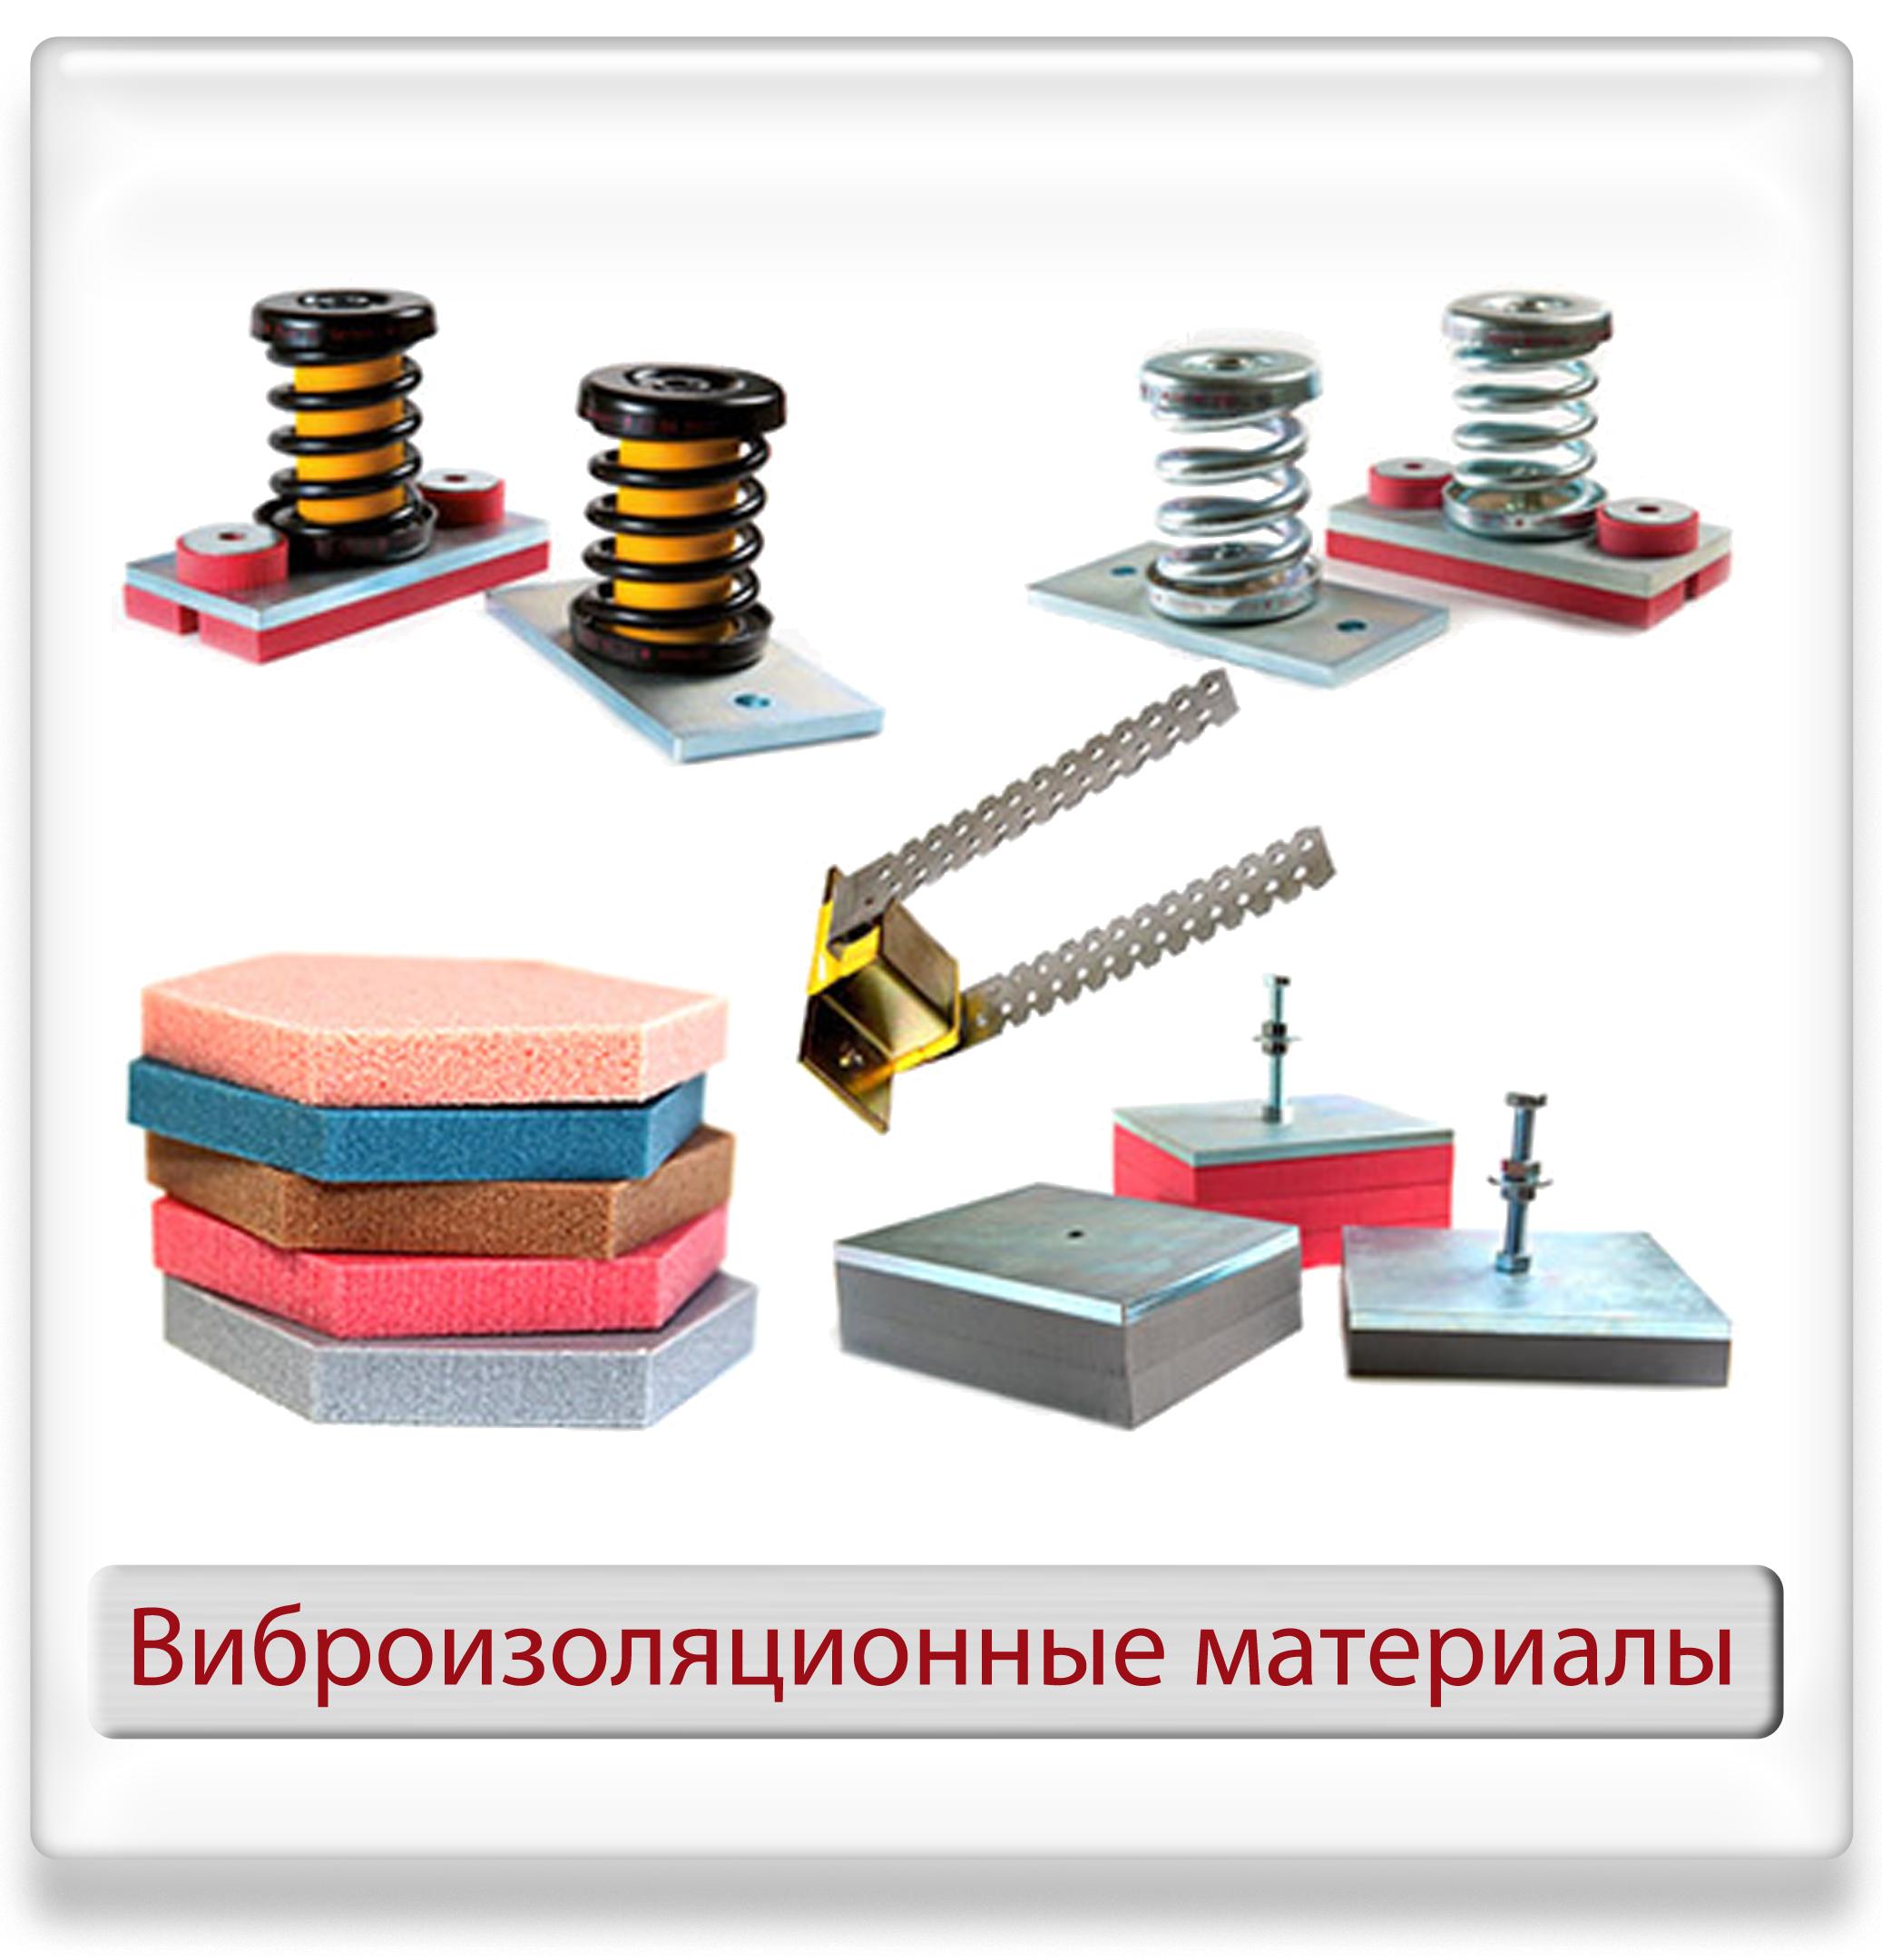 Материалы для виброизоляции